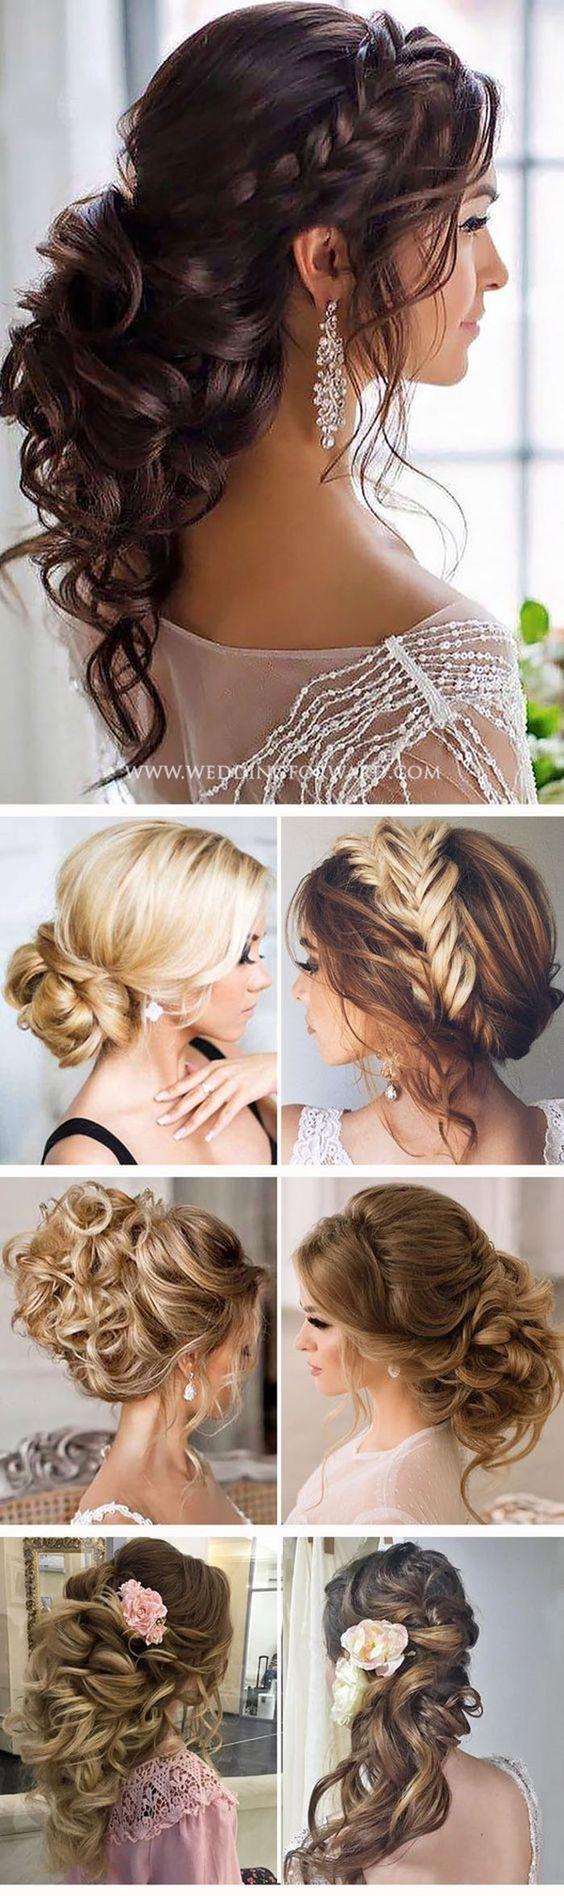 Bridal wedding hairstyle inspiration for long hair wedding